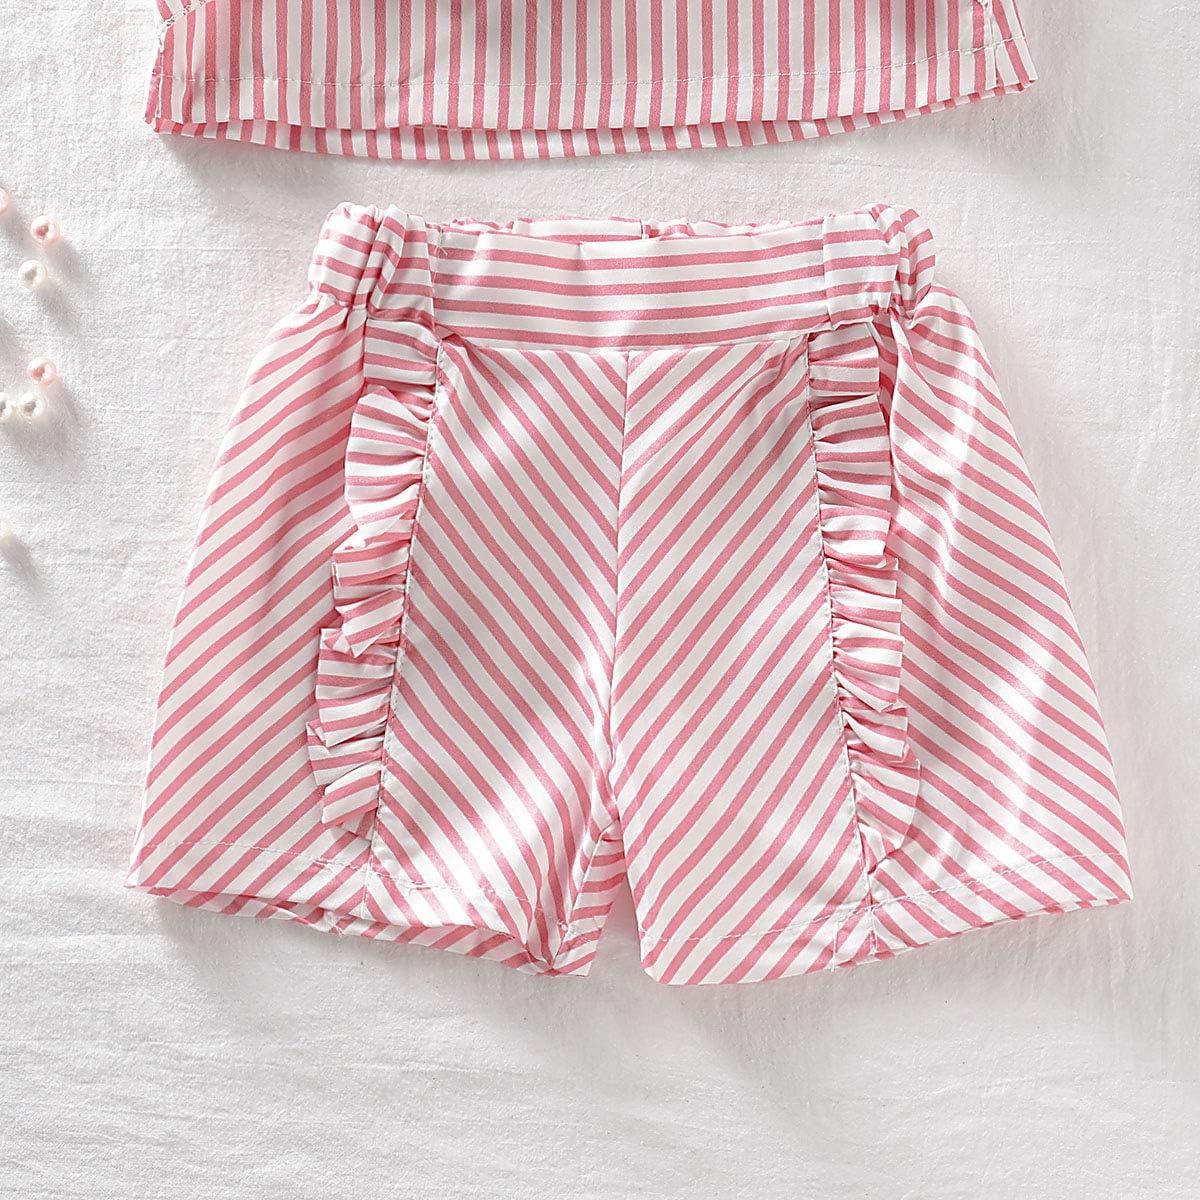 Toddler Baby Girl Floral Halter Ruffled Outfits Set Strap Crop Tops+Short Pants 2 PCS Clothes Set